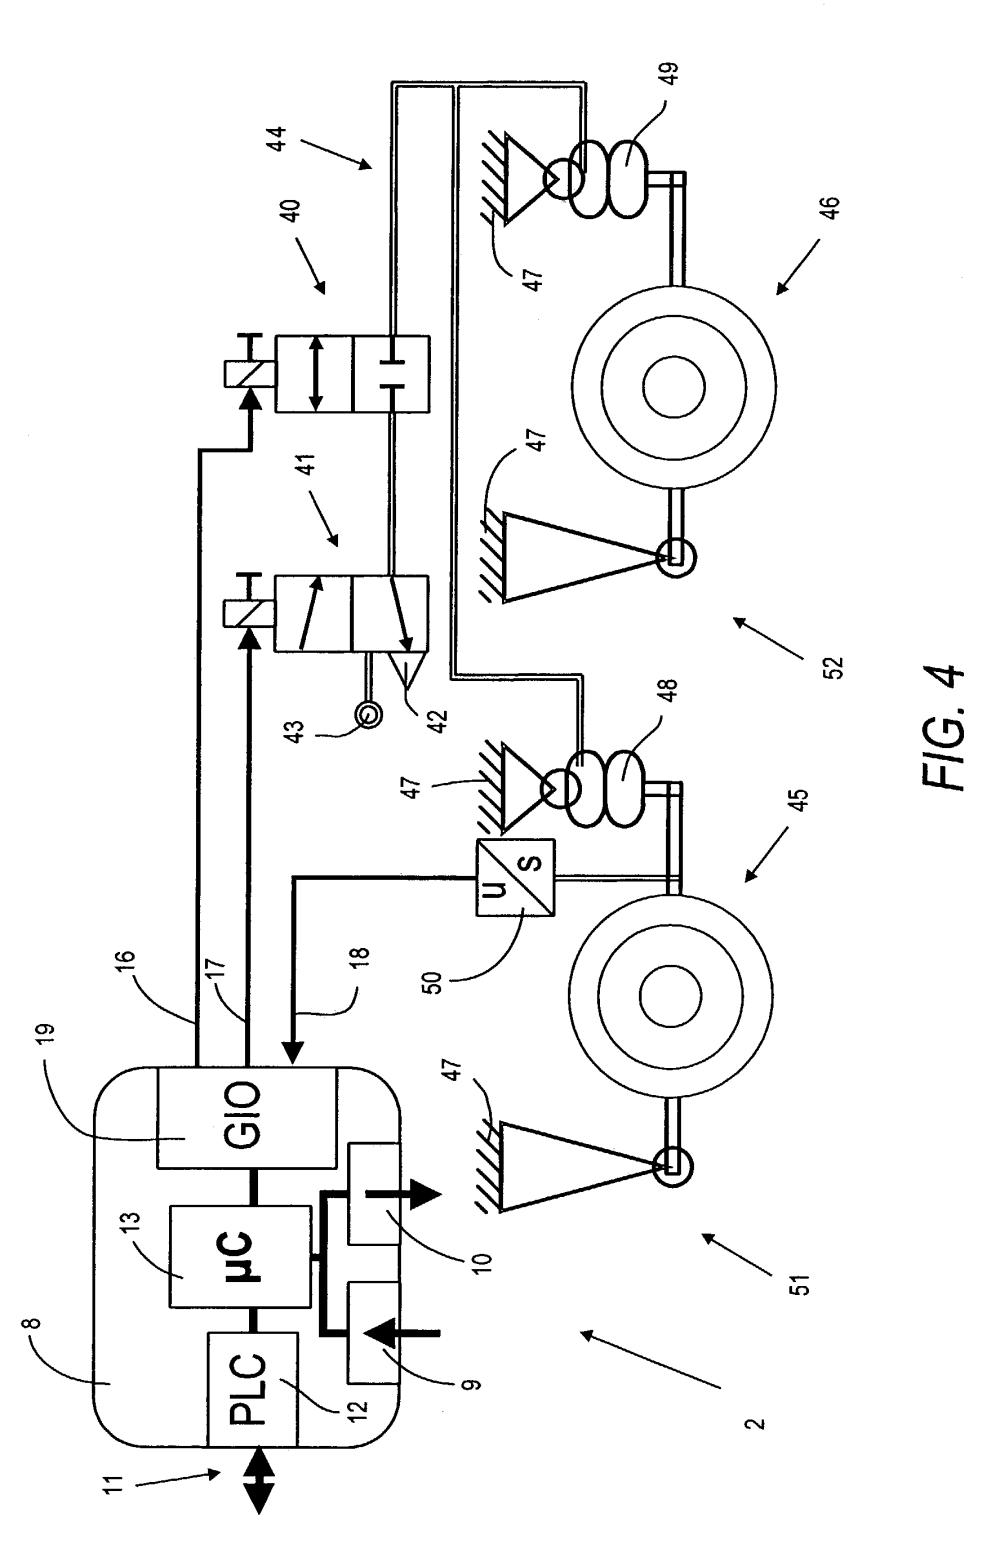 medium resolution of wiring diagram acura rdx page 5 wiring diagram and schematics 2014 acura rdx colors 2015 acura